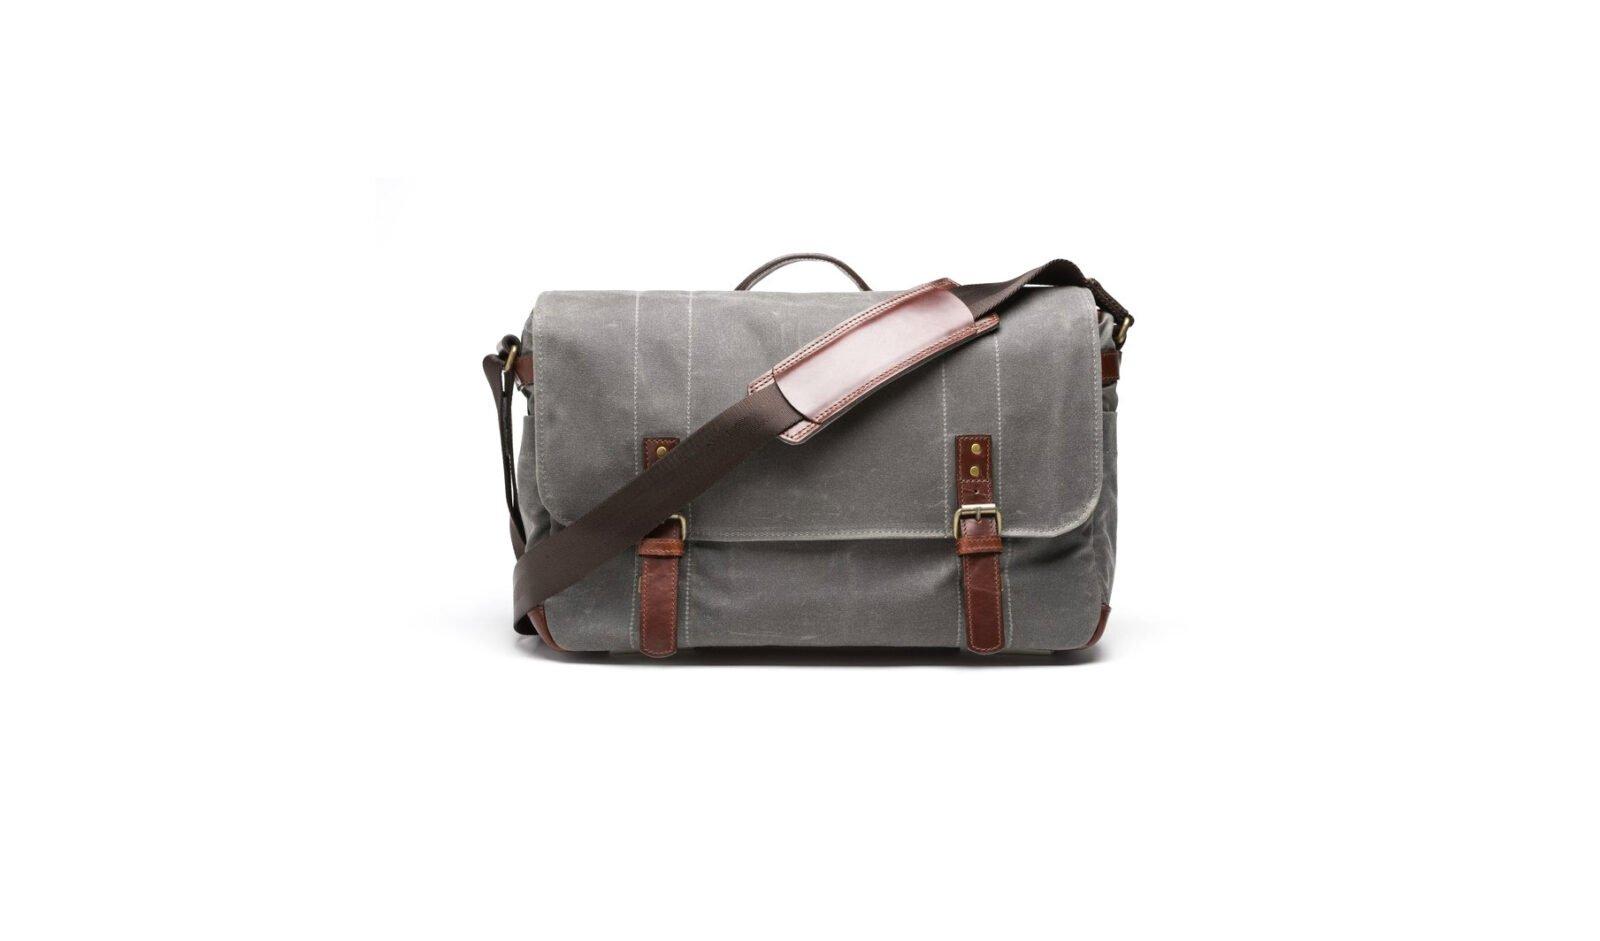 Camera Bag 1600x941 - Union Street Camera + Laptop Bag